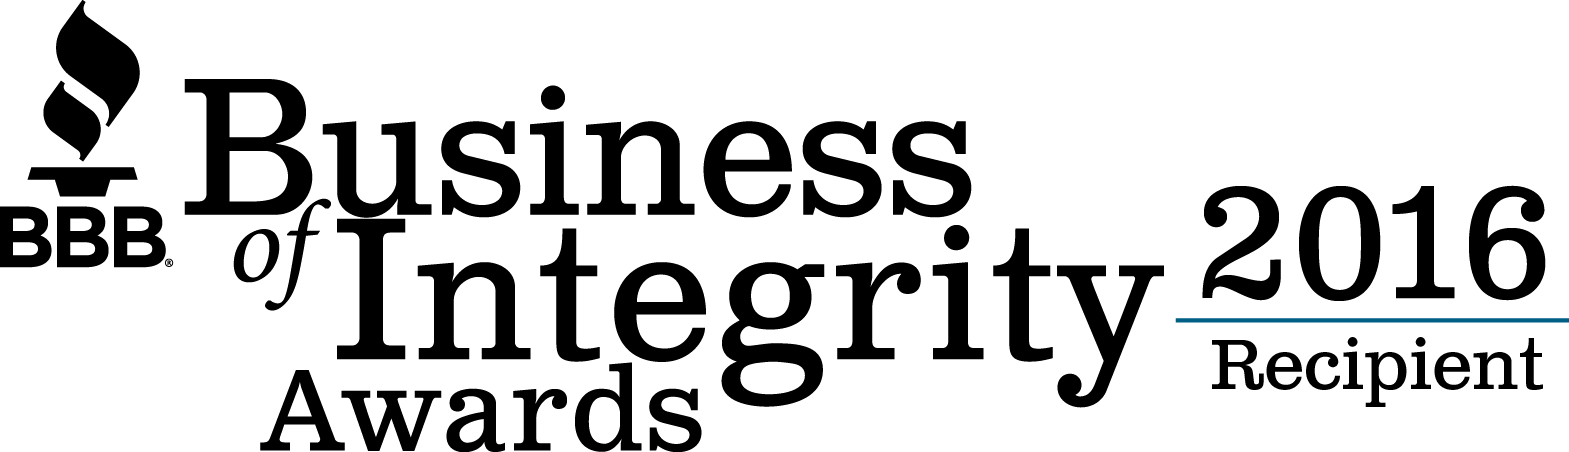 Boi 2016  Horizontal  Black